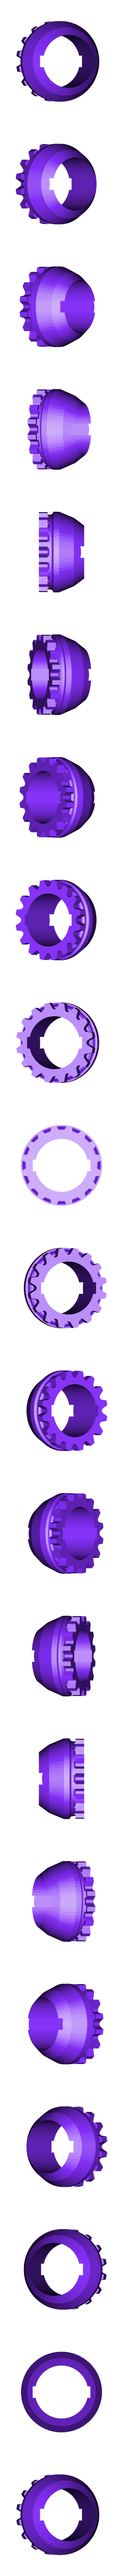 Imp-Coupling01.stl Download free STL file Turboprop Engine • 3D printable model, konchan77